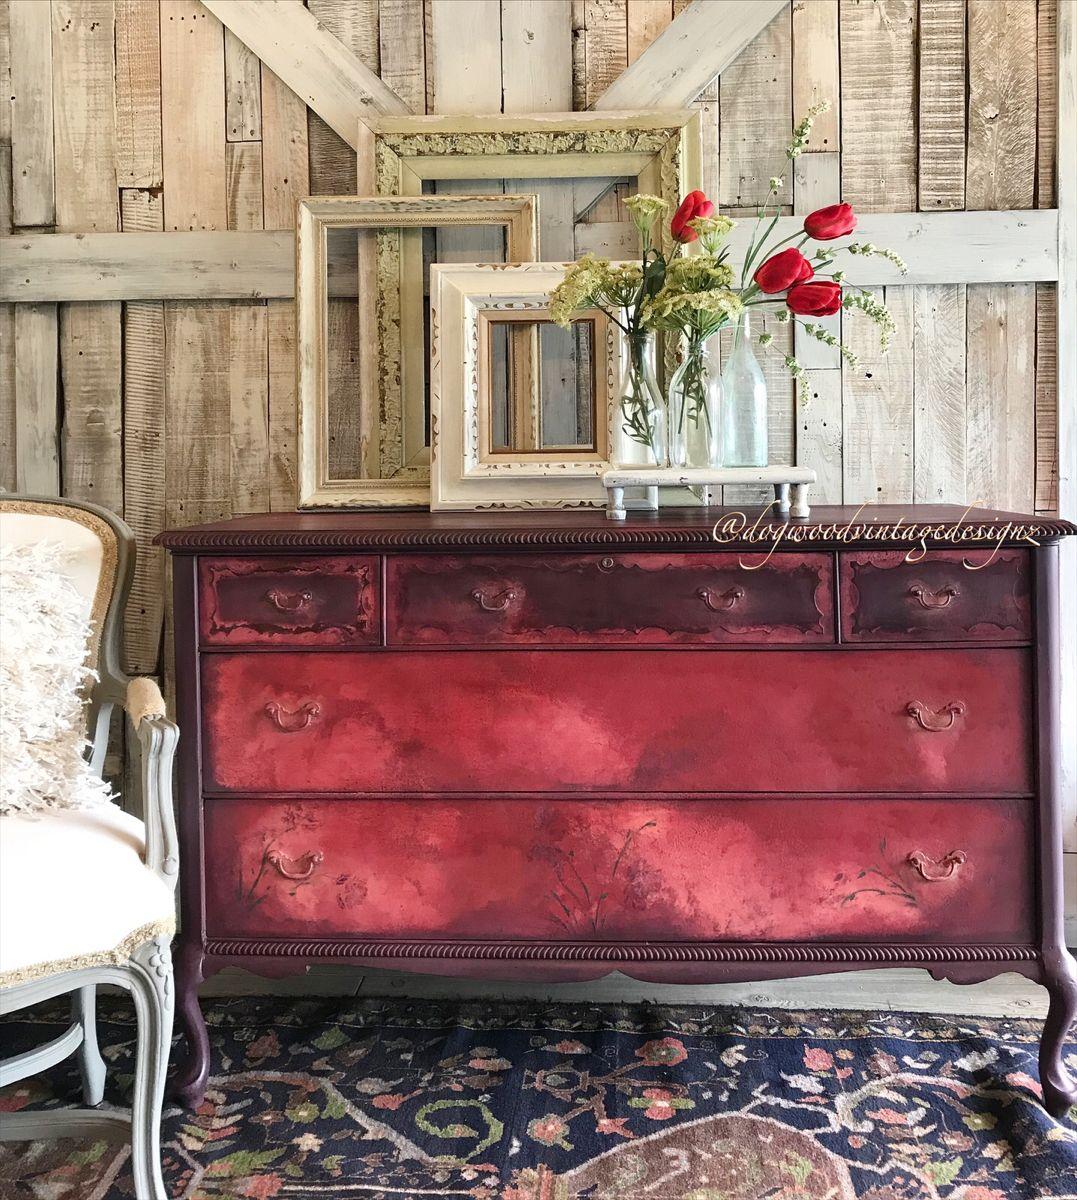 #furnitureartist #interiordesigner #diylove #beautifulhome #layered #vintage furniture #ilovetopaint #modern #romantic #mauve #moderndecor #retro #repurposedvintage #patina #bohoismyjam #bohoglam #furnitureflip